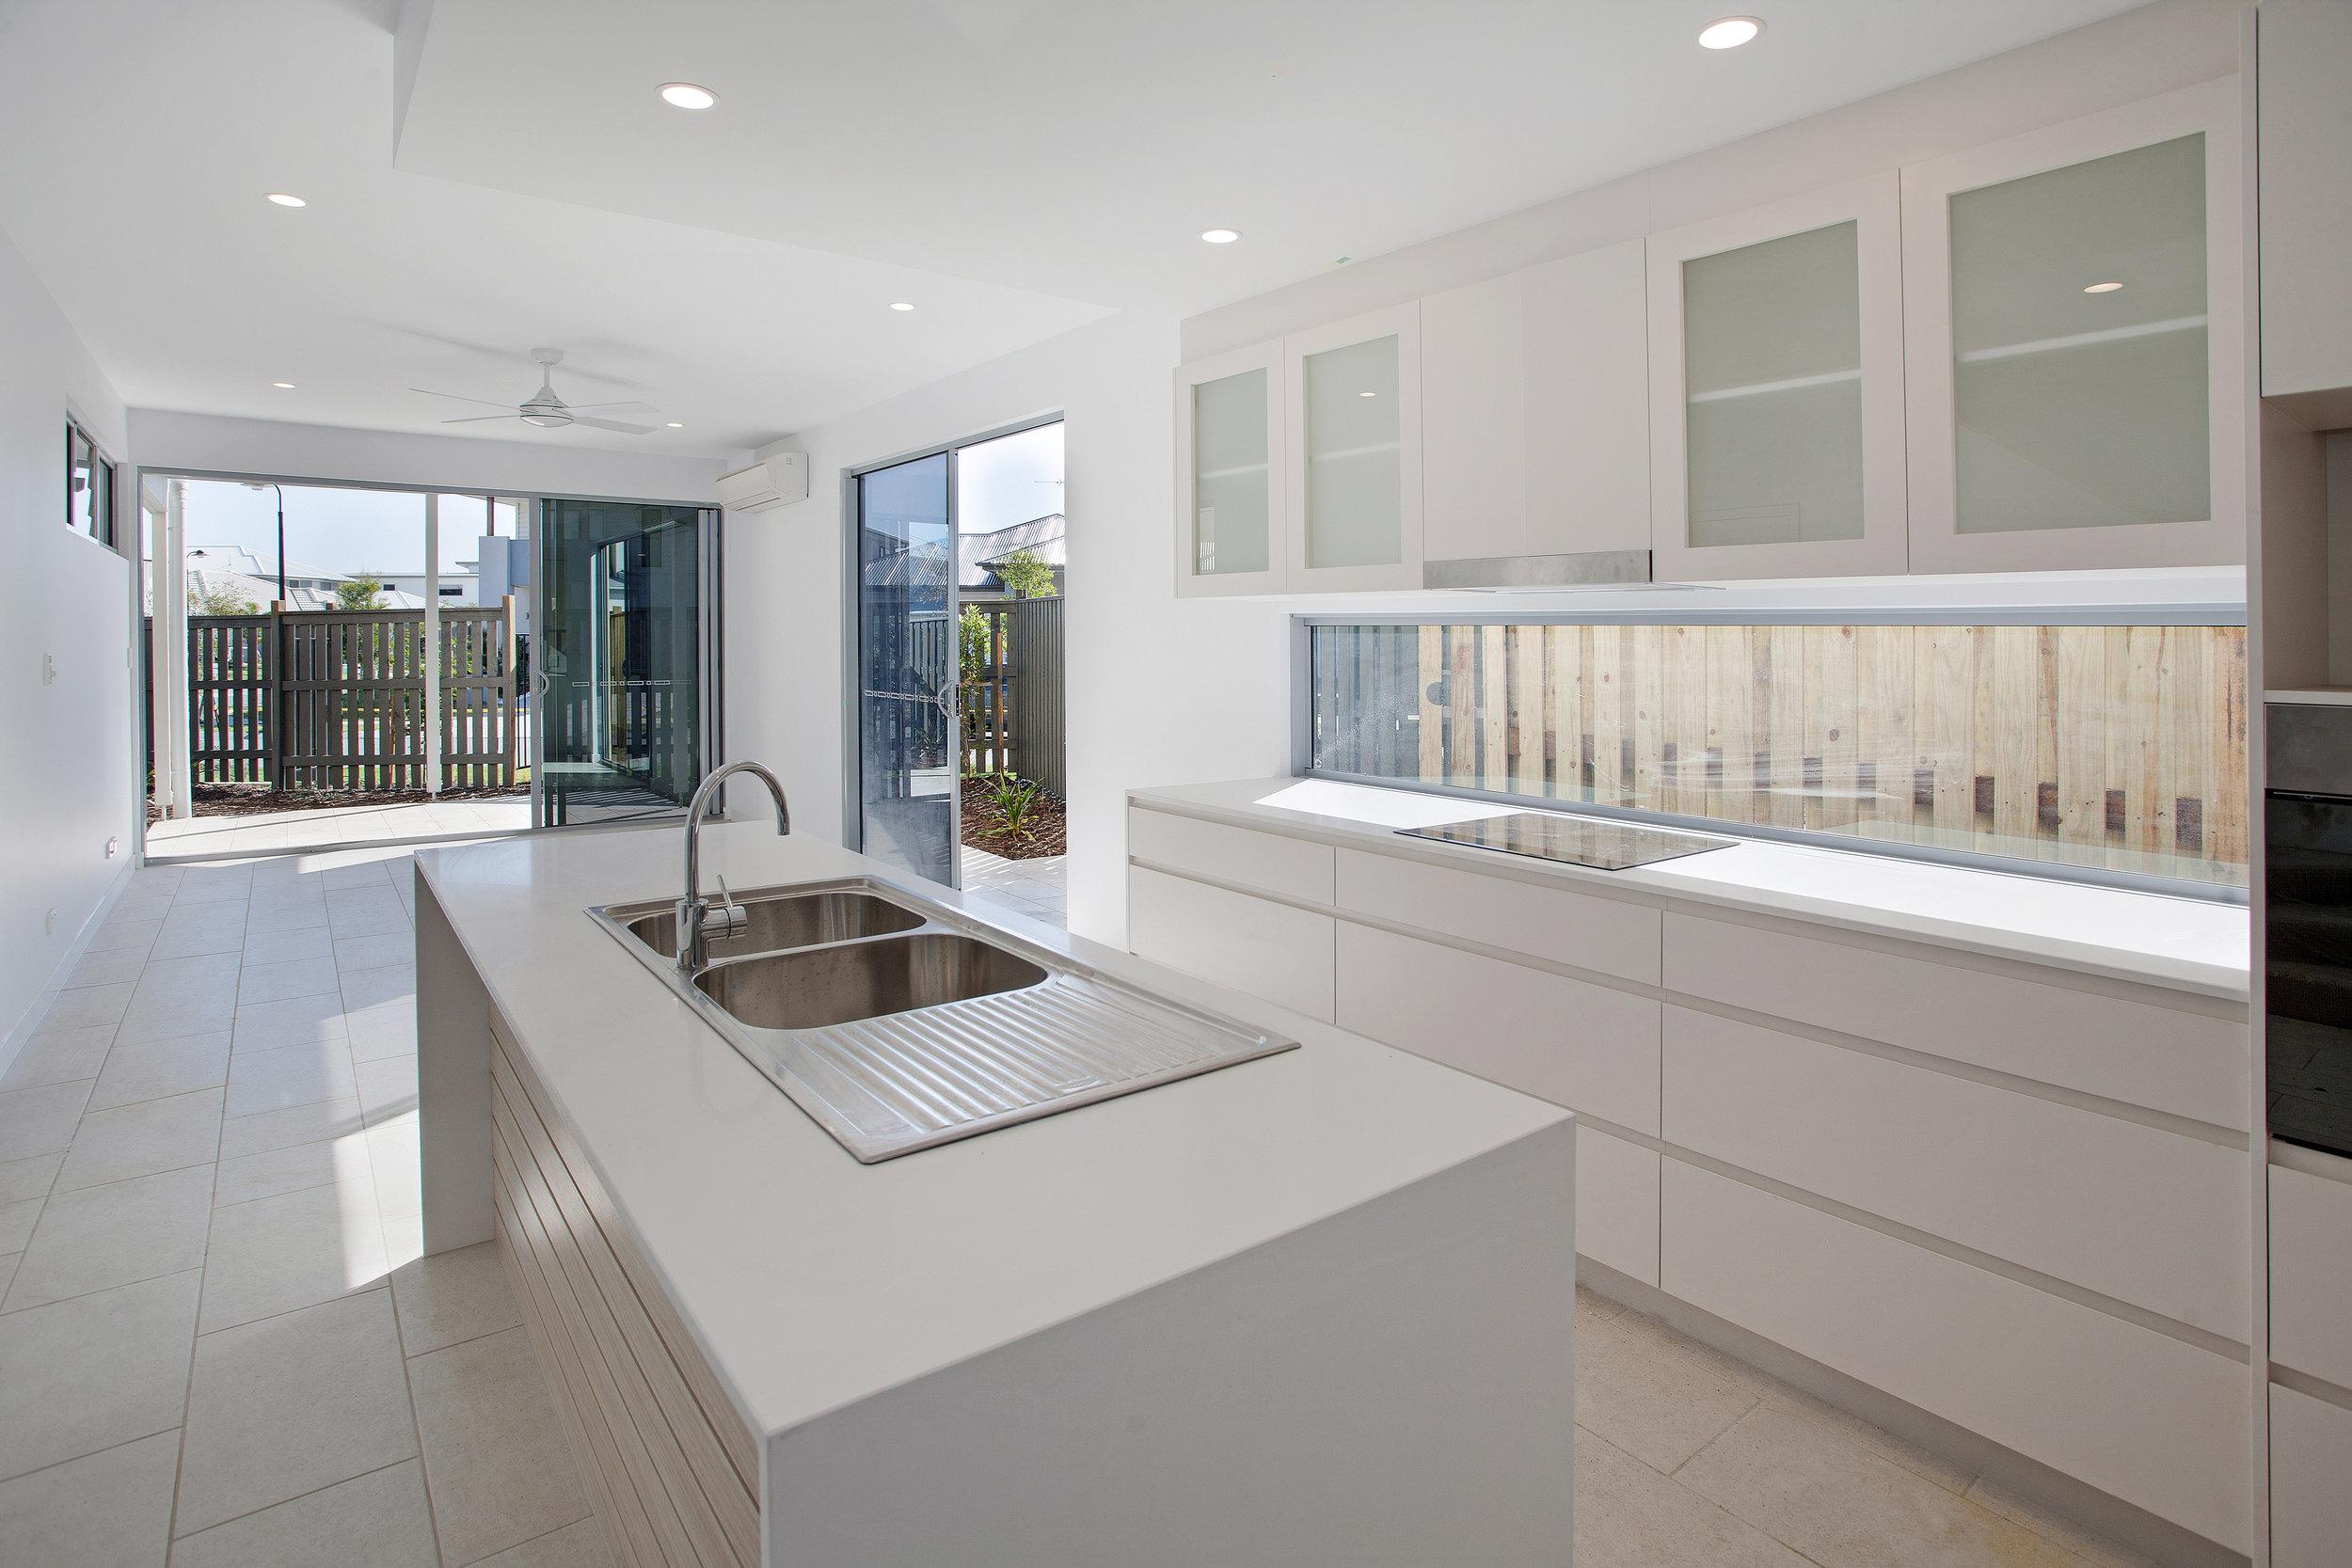 oxford kitchen (2) floor tiles clean.jpg